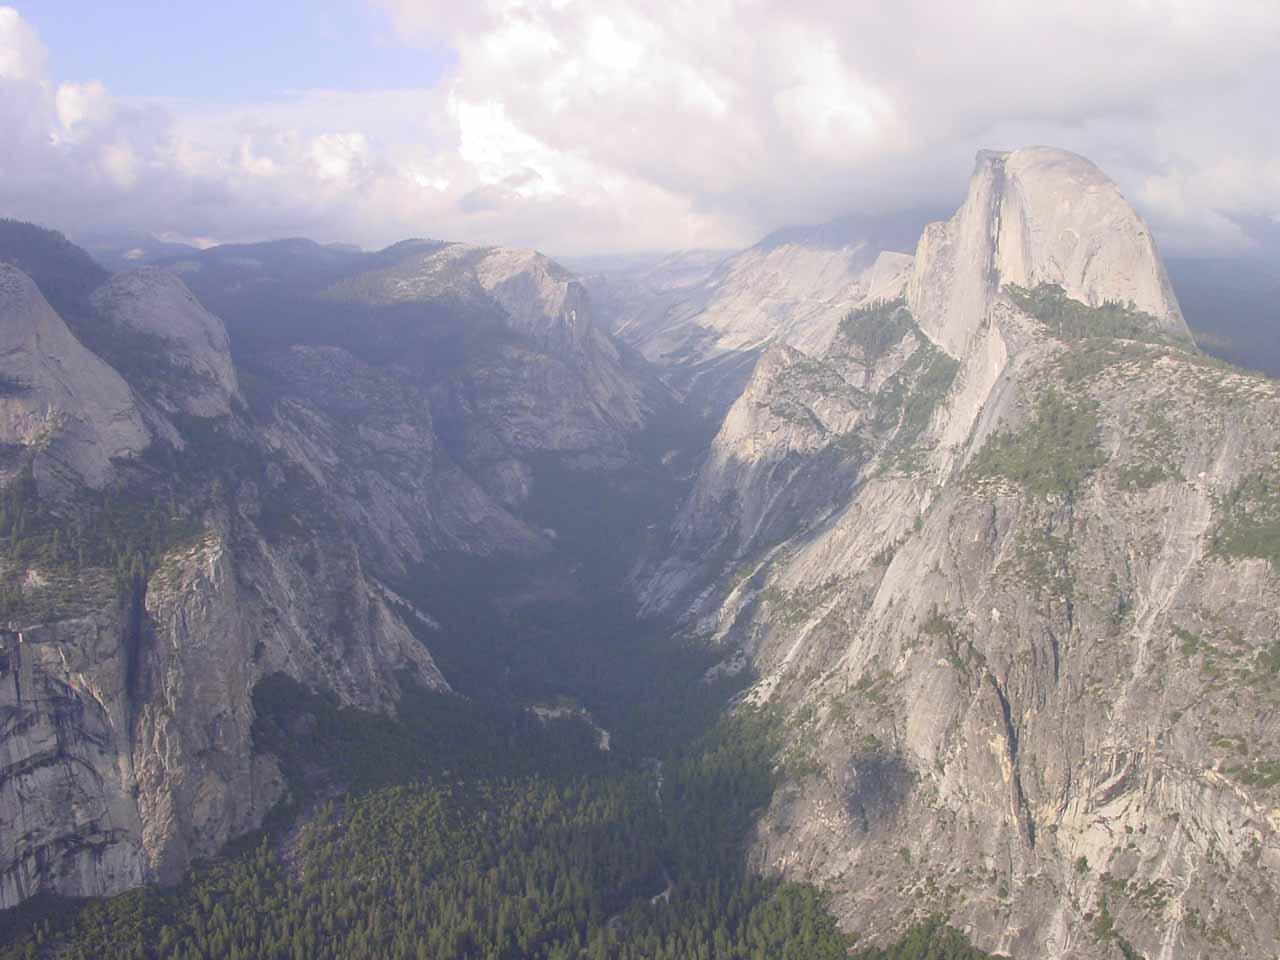 Glacier Point Falls Yosemite National Park California USA